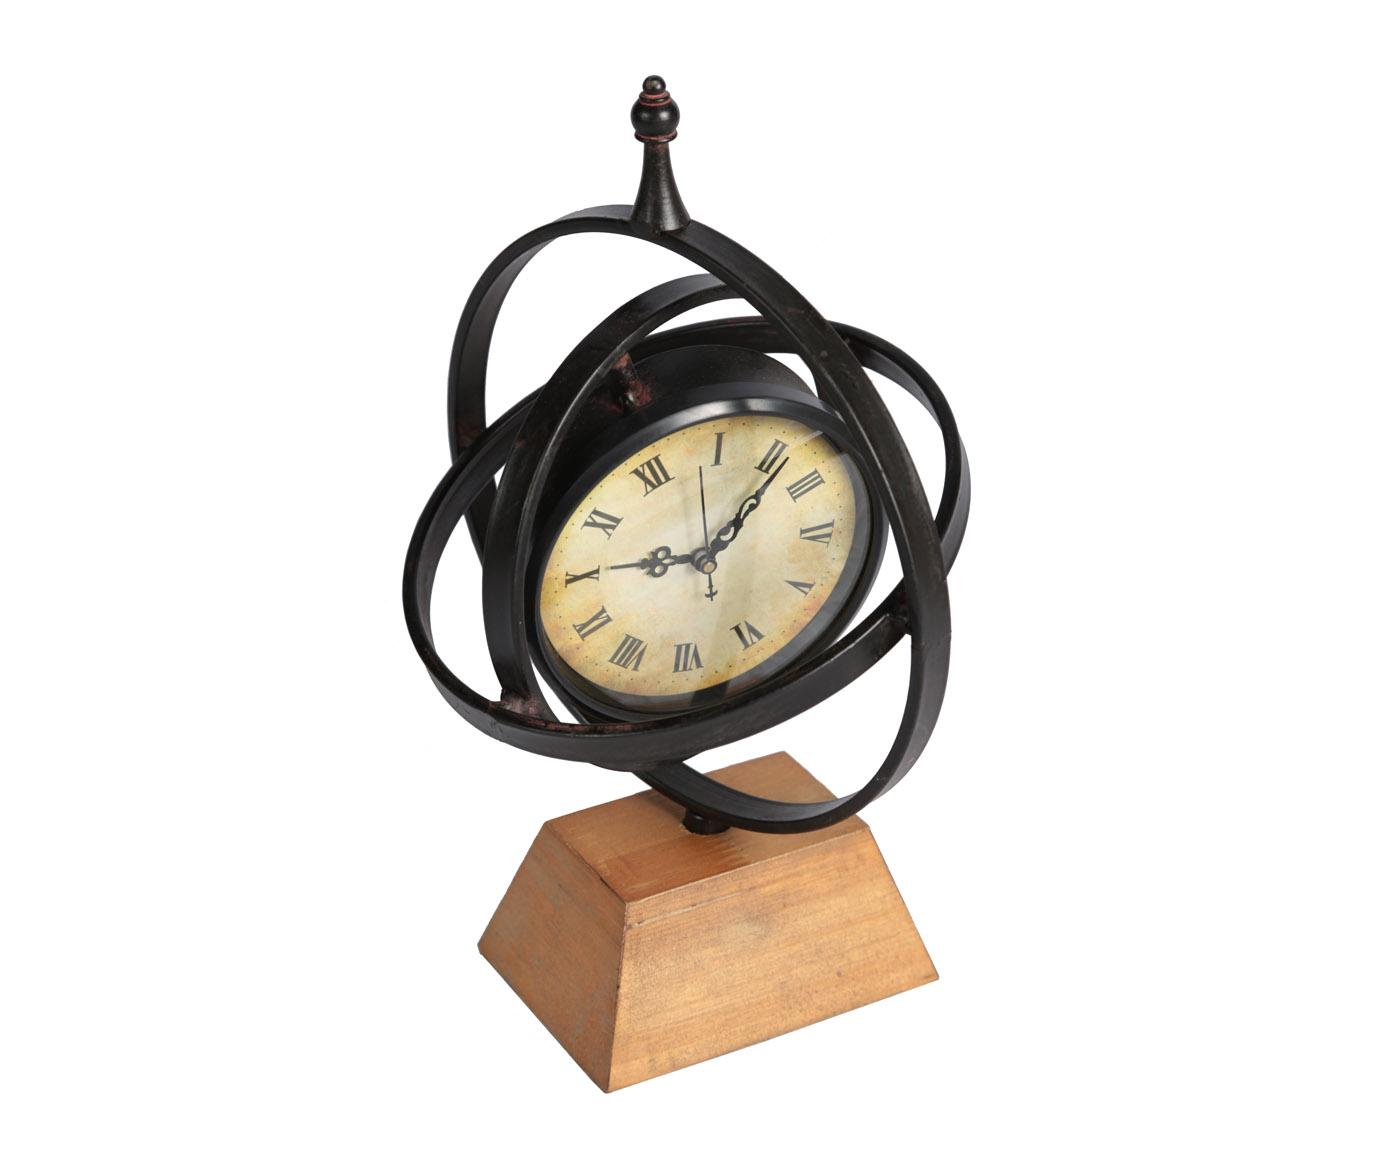 Часы настольныеНастольные часы<br>Кварцевый механизм, работают от батарейки типа АА.<br><br>Material: Металл<br>Width см: 23<br>Depth см: 17<br>Height см: 33